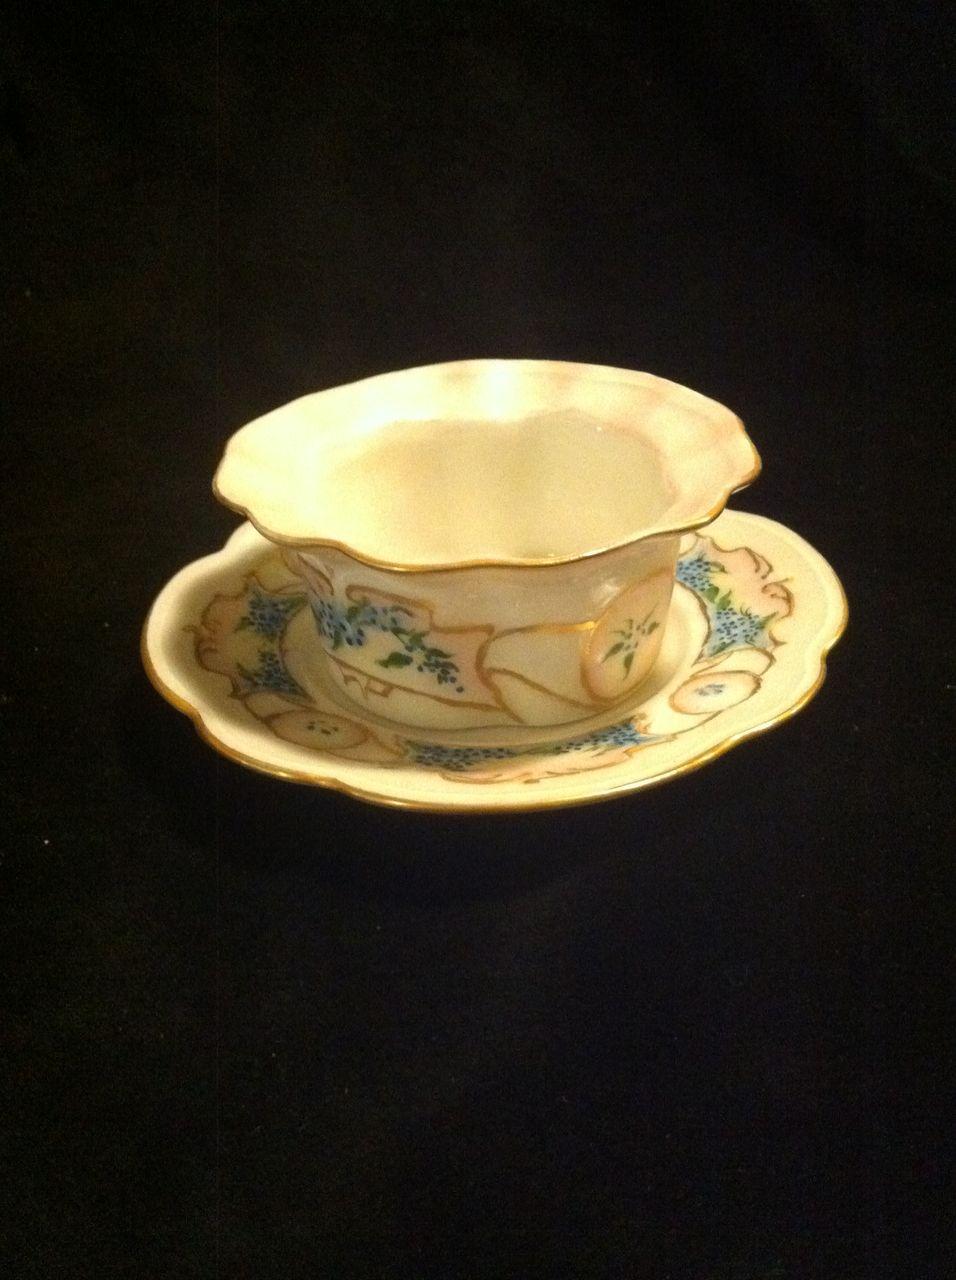 Altrohlau Austria Handpainted Bowl and Saucer